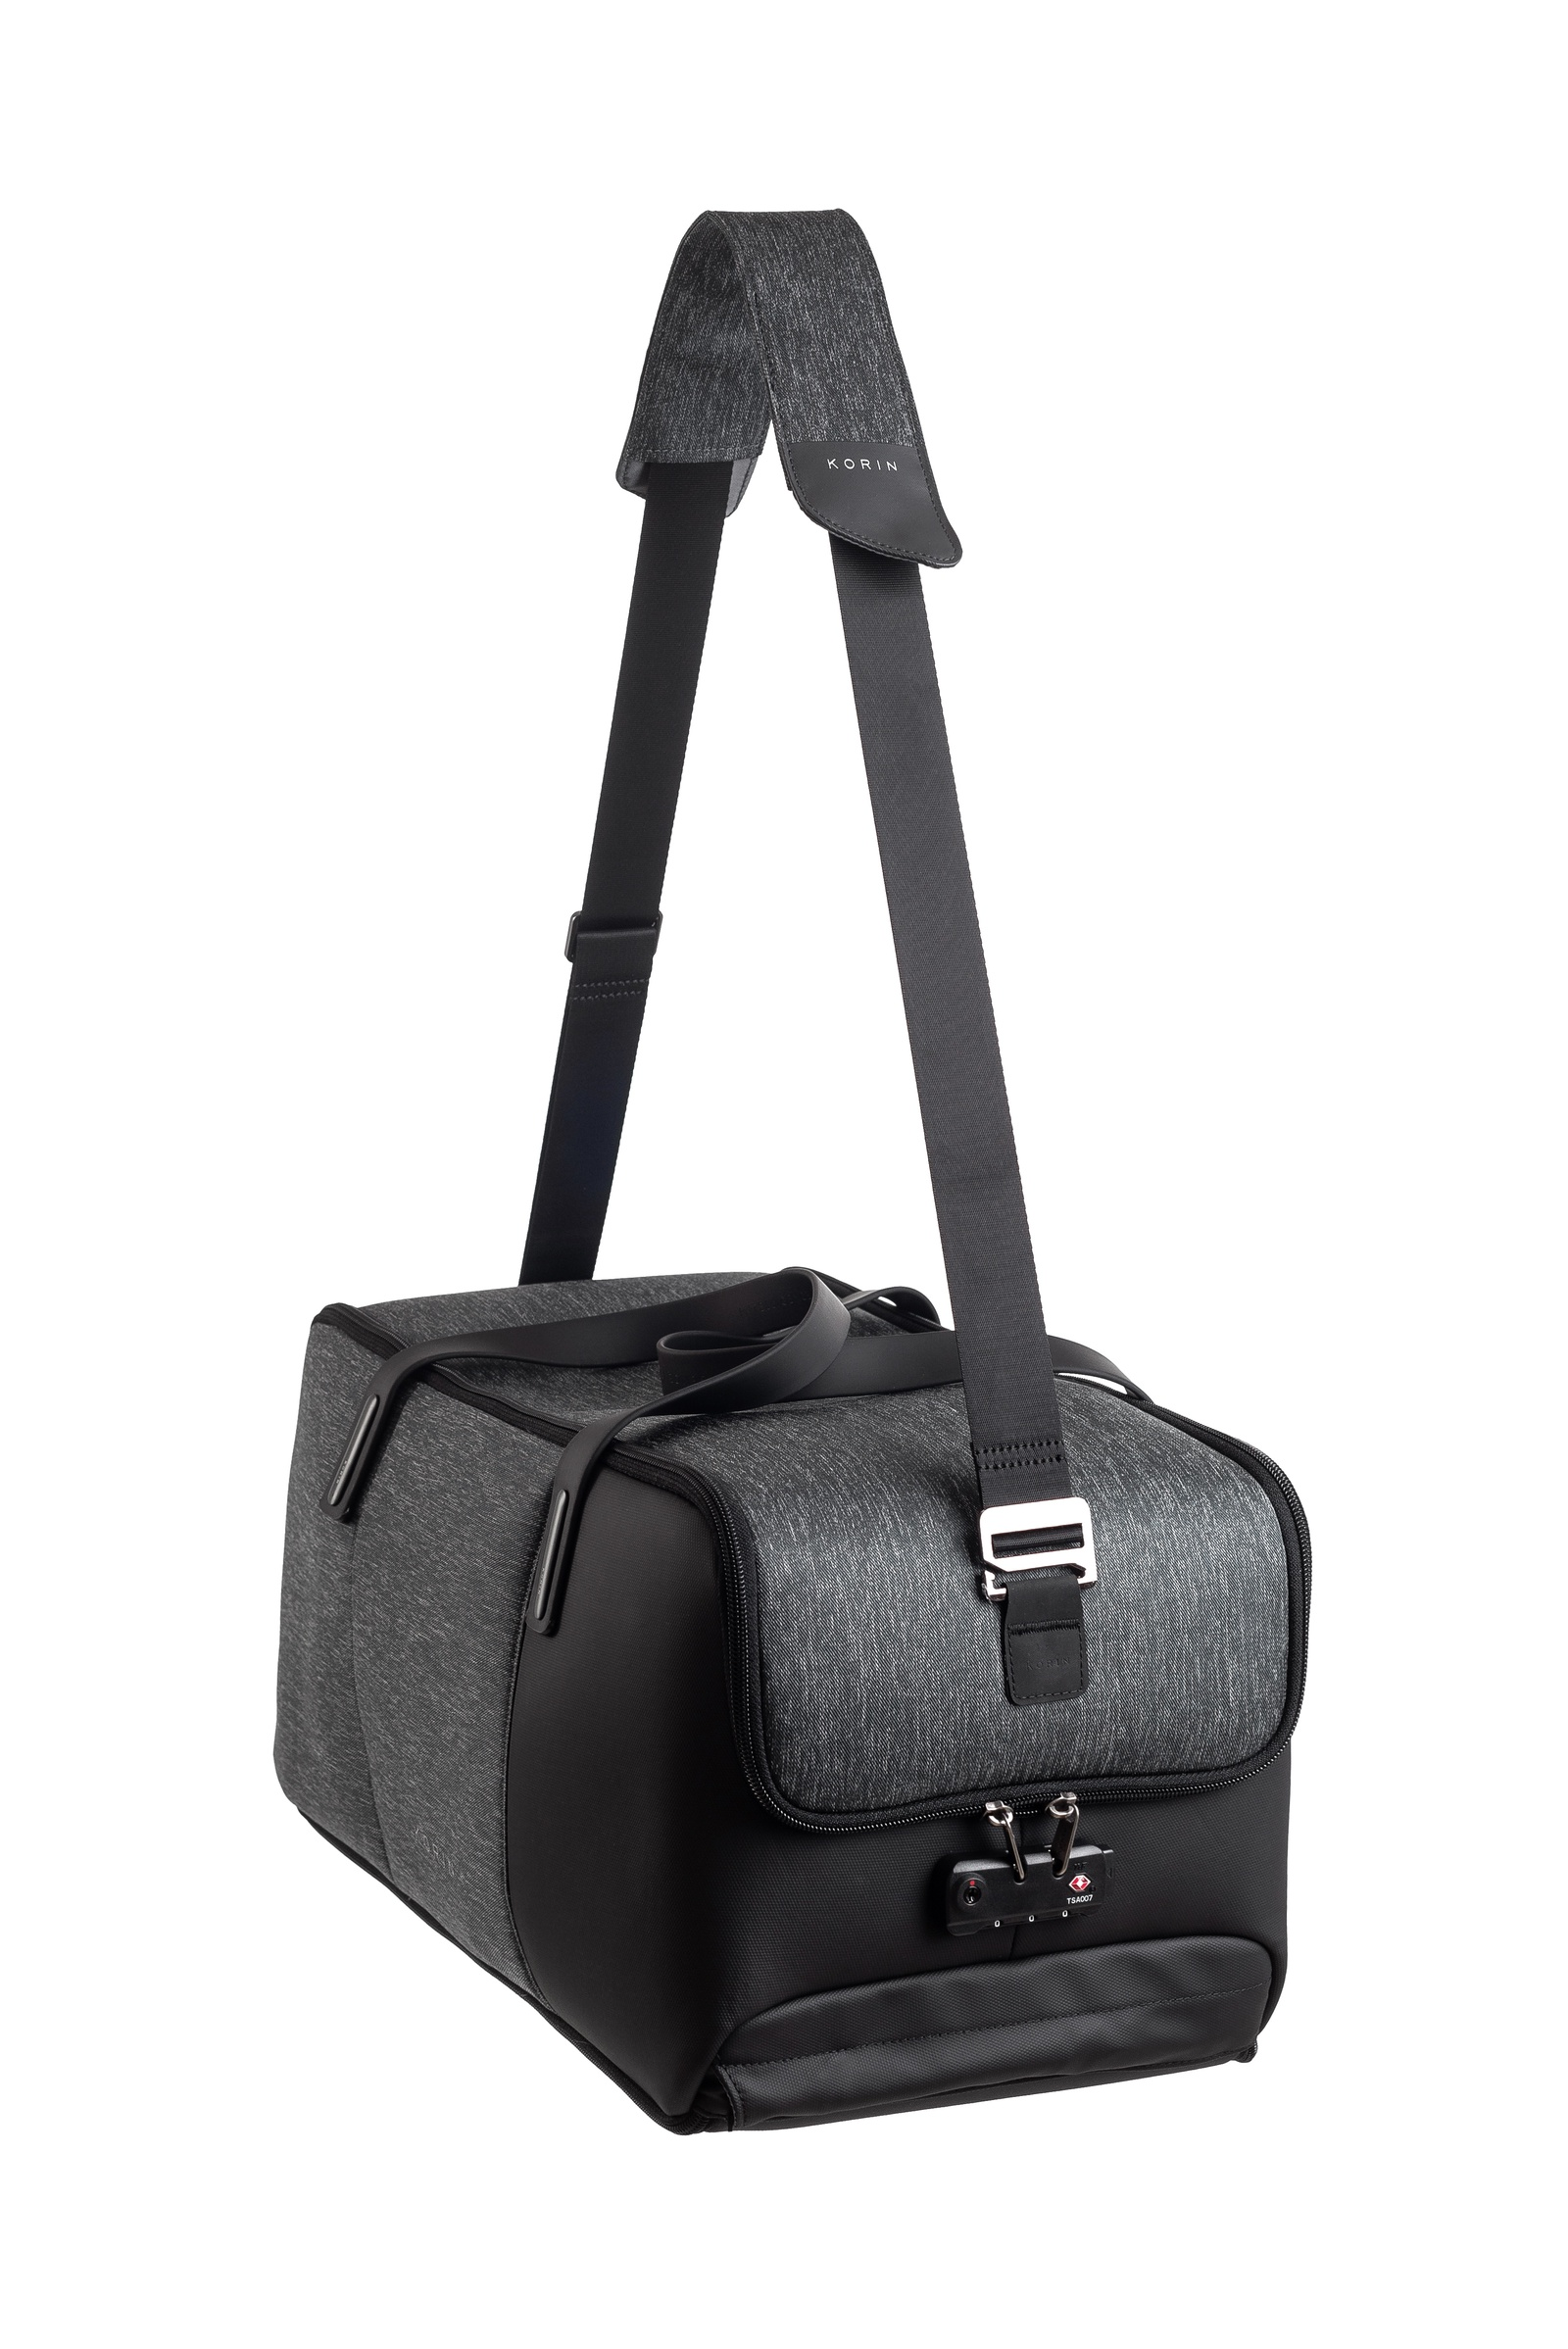 Сумка дорожная KORIN Design FlexPack Go, темно-серый рюкзак korin design clickpack gray серый